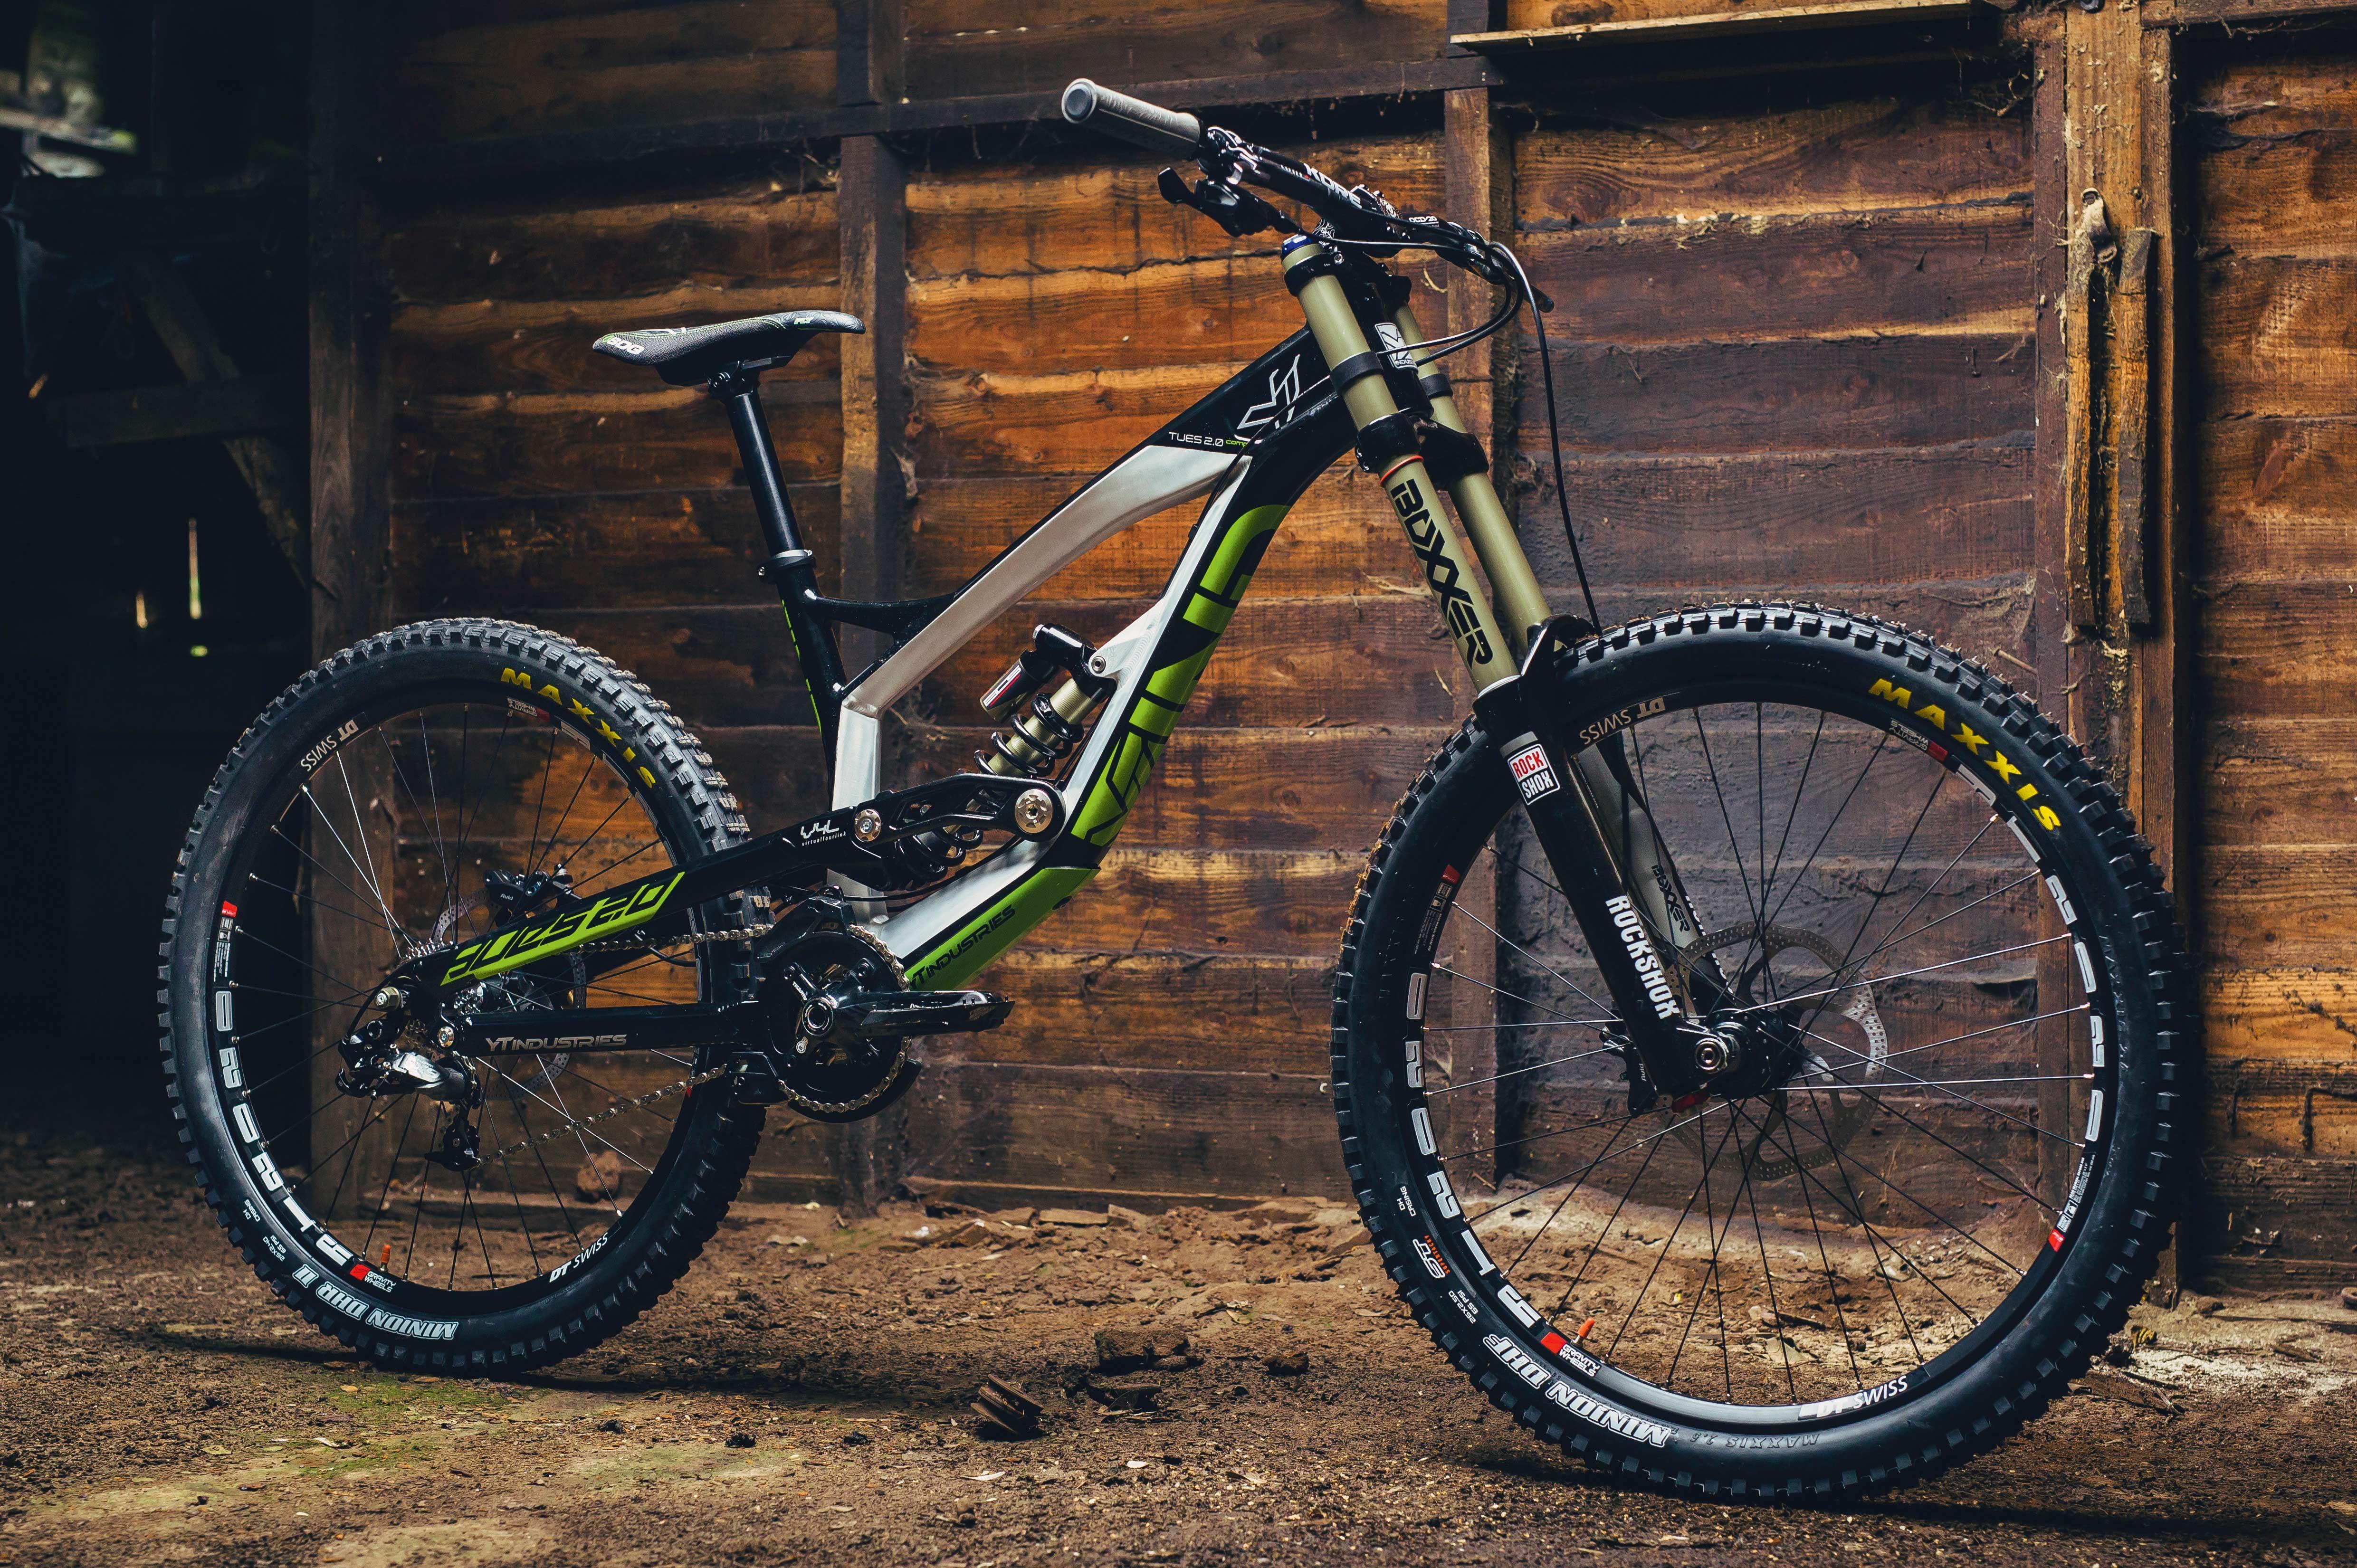 Yt Tues Radtouren Fahrrad Fahren Fahrrad Design